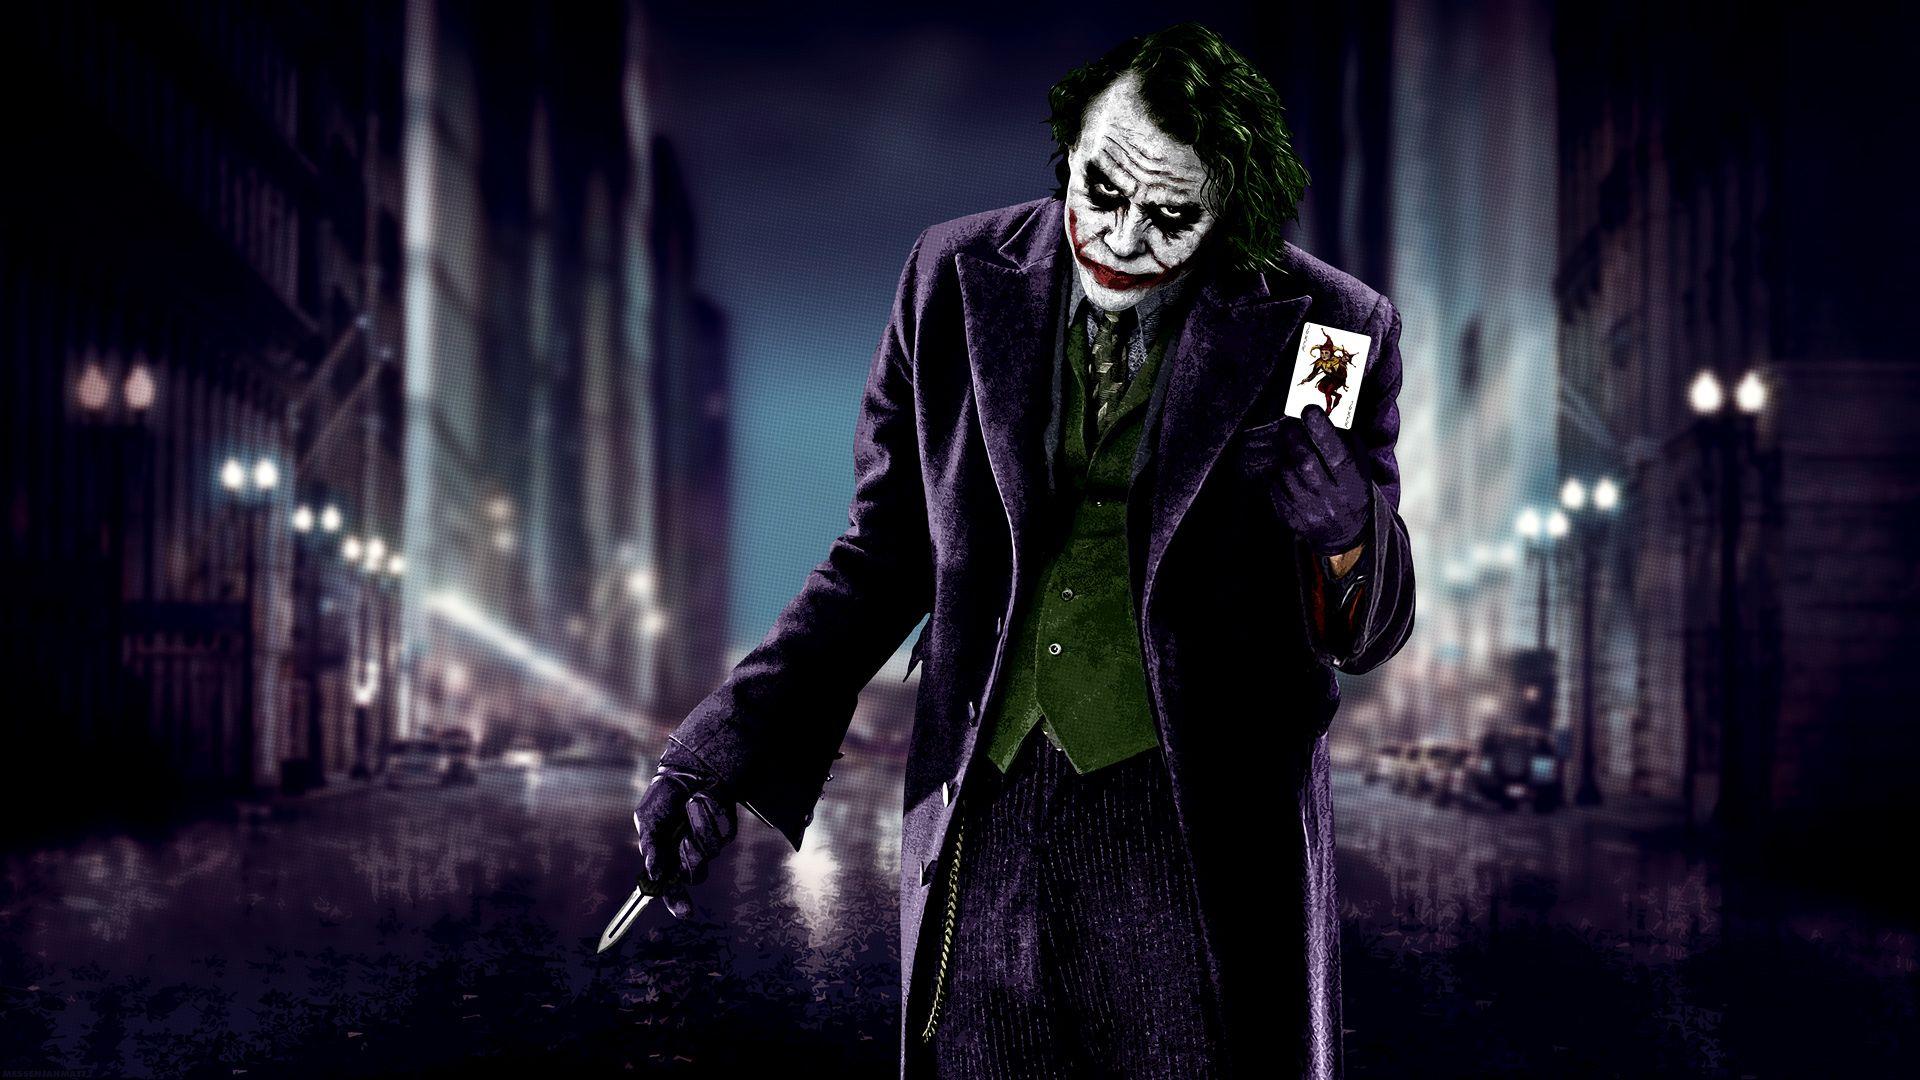 Hd wallpaper of joker - Joker Cards Images Desktop Hd Wallpaper